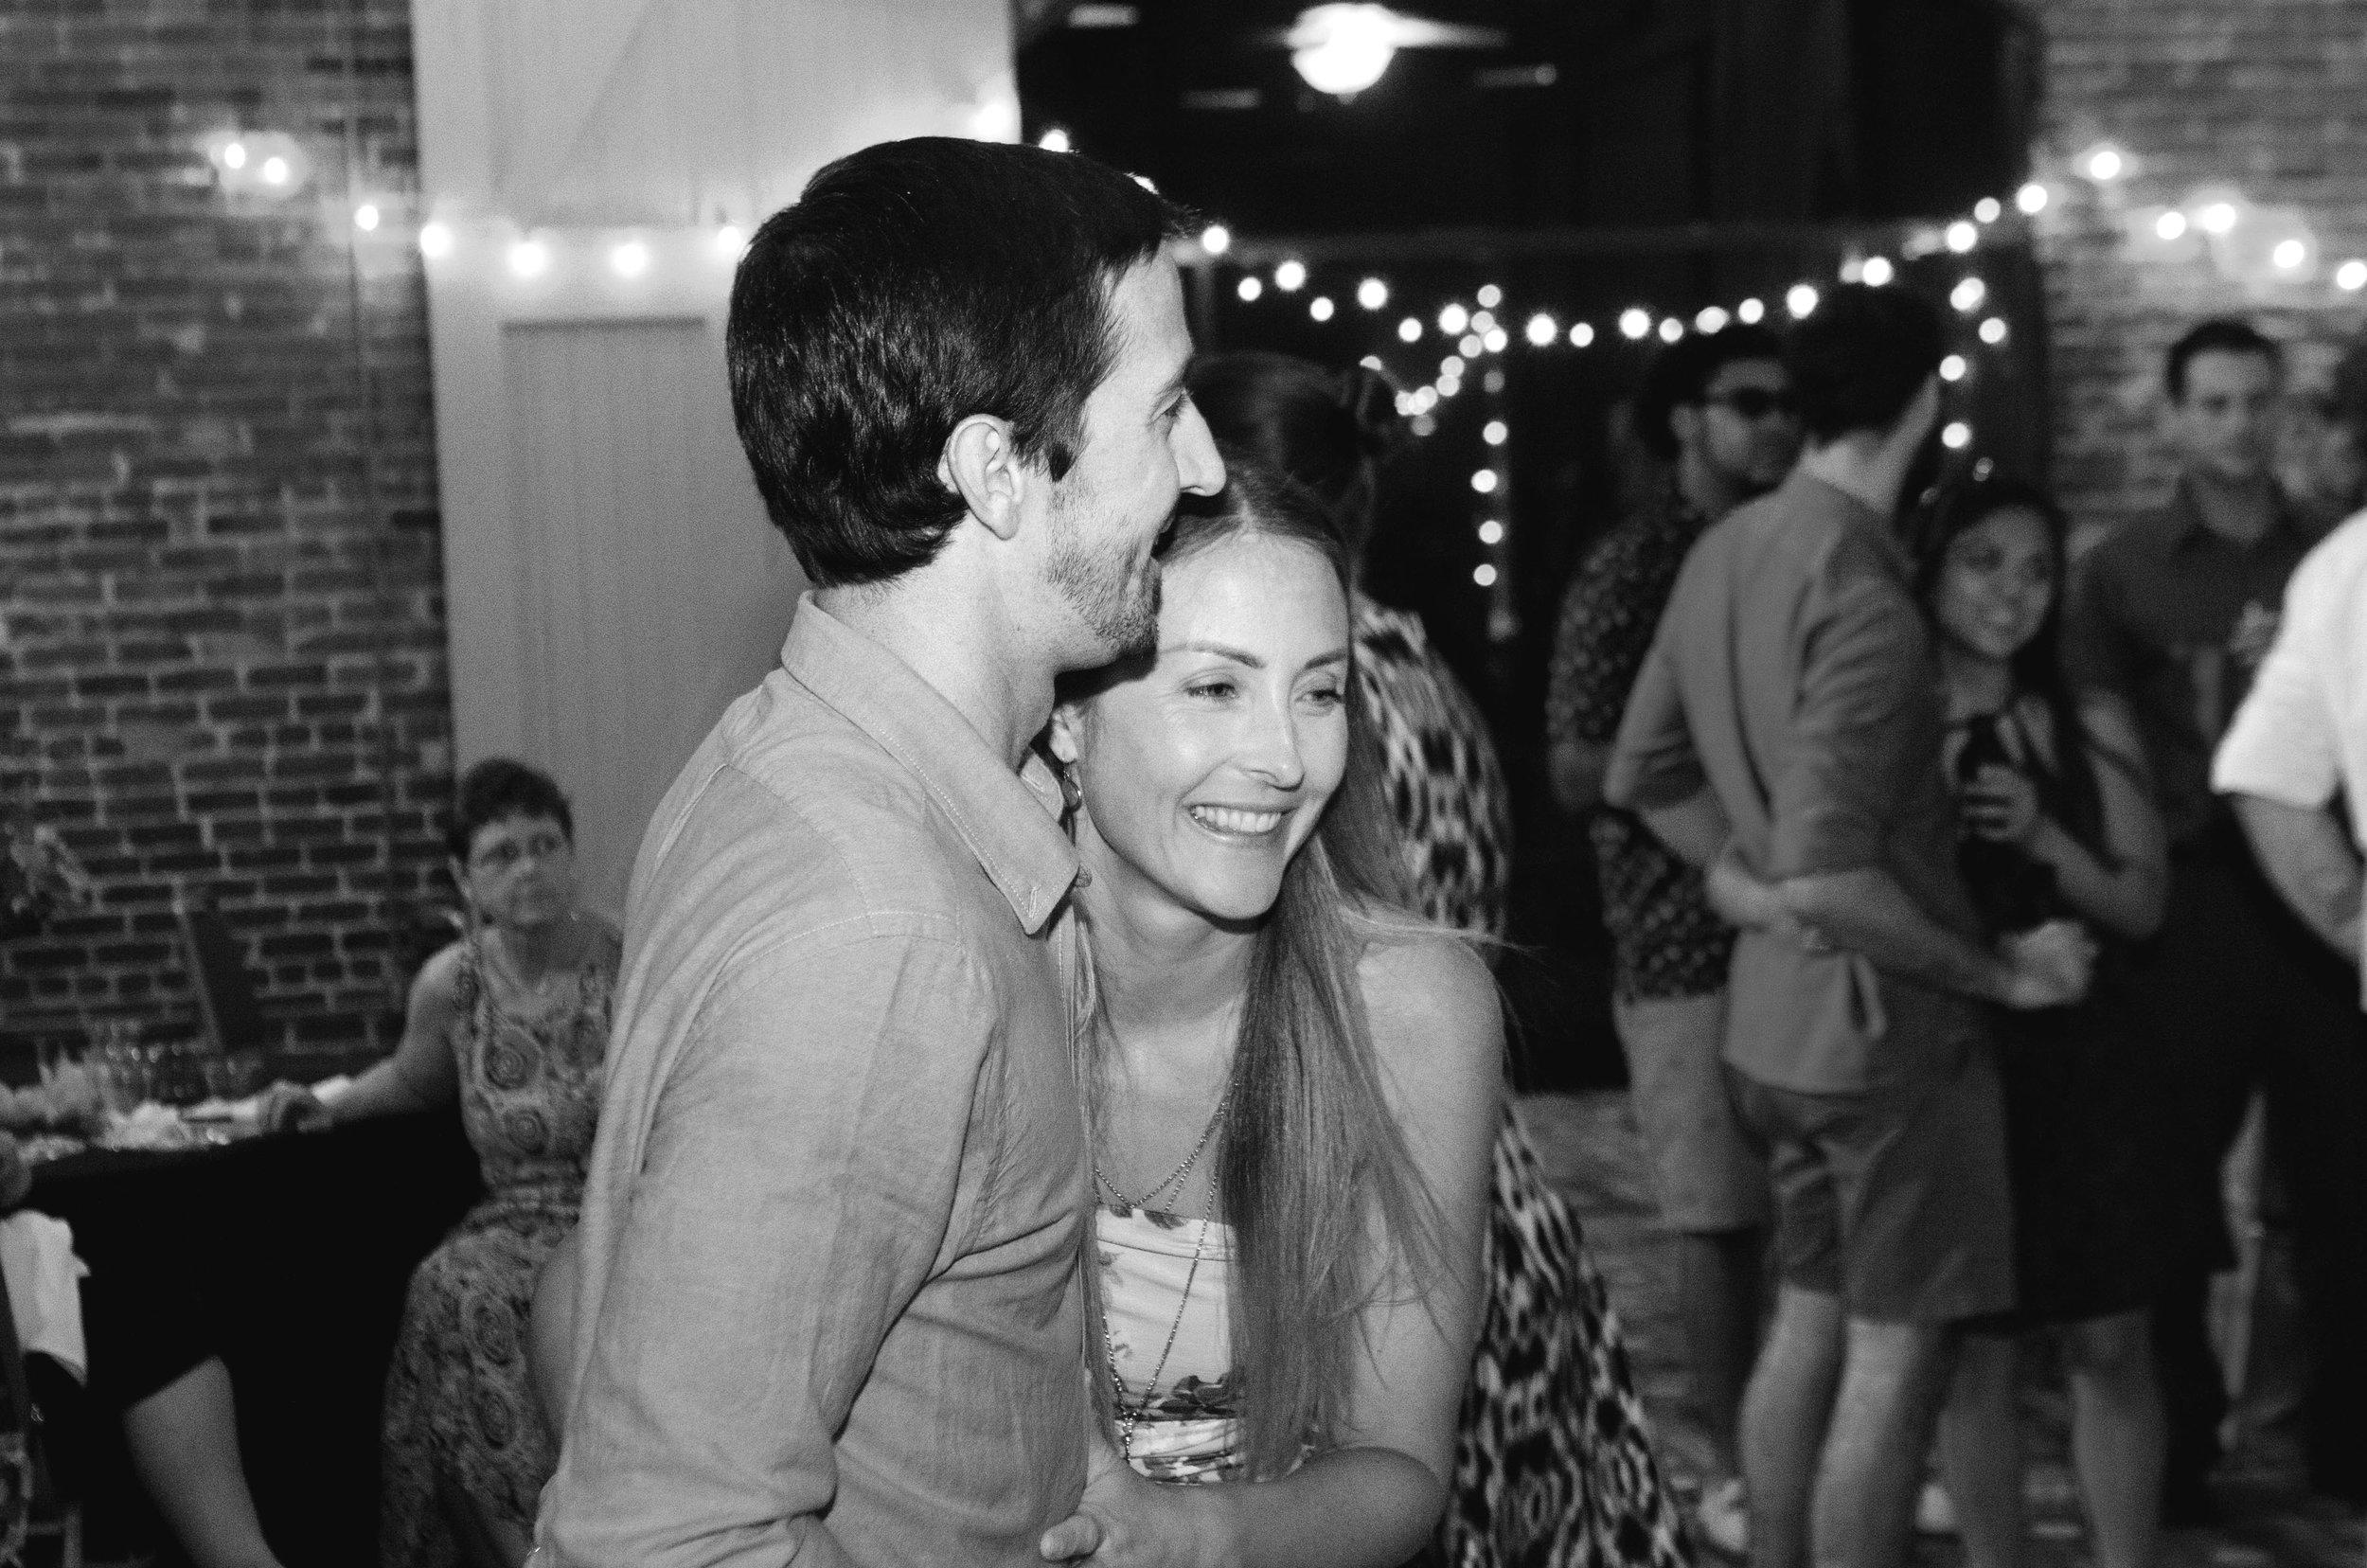 North_Carolina_Wedding_Photographer_Tiffany_Abruzzo_Reception_177.jpg